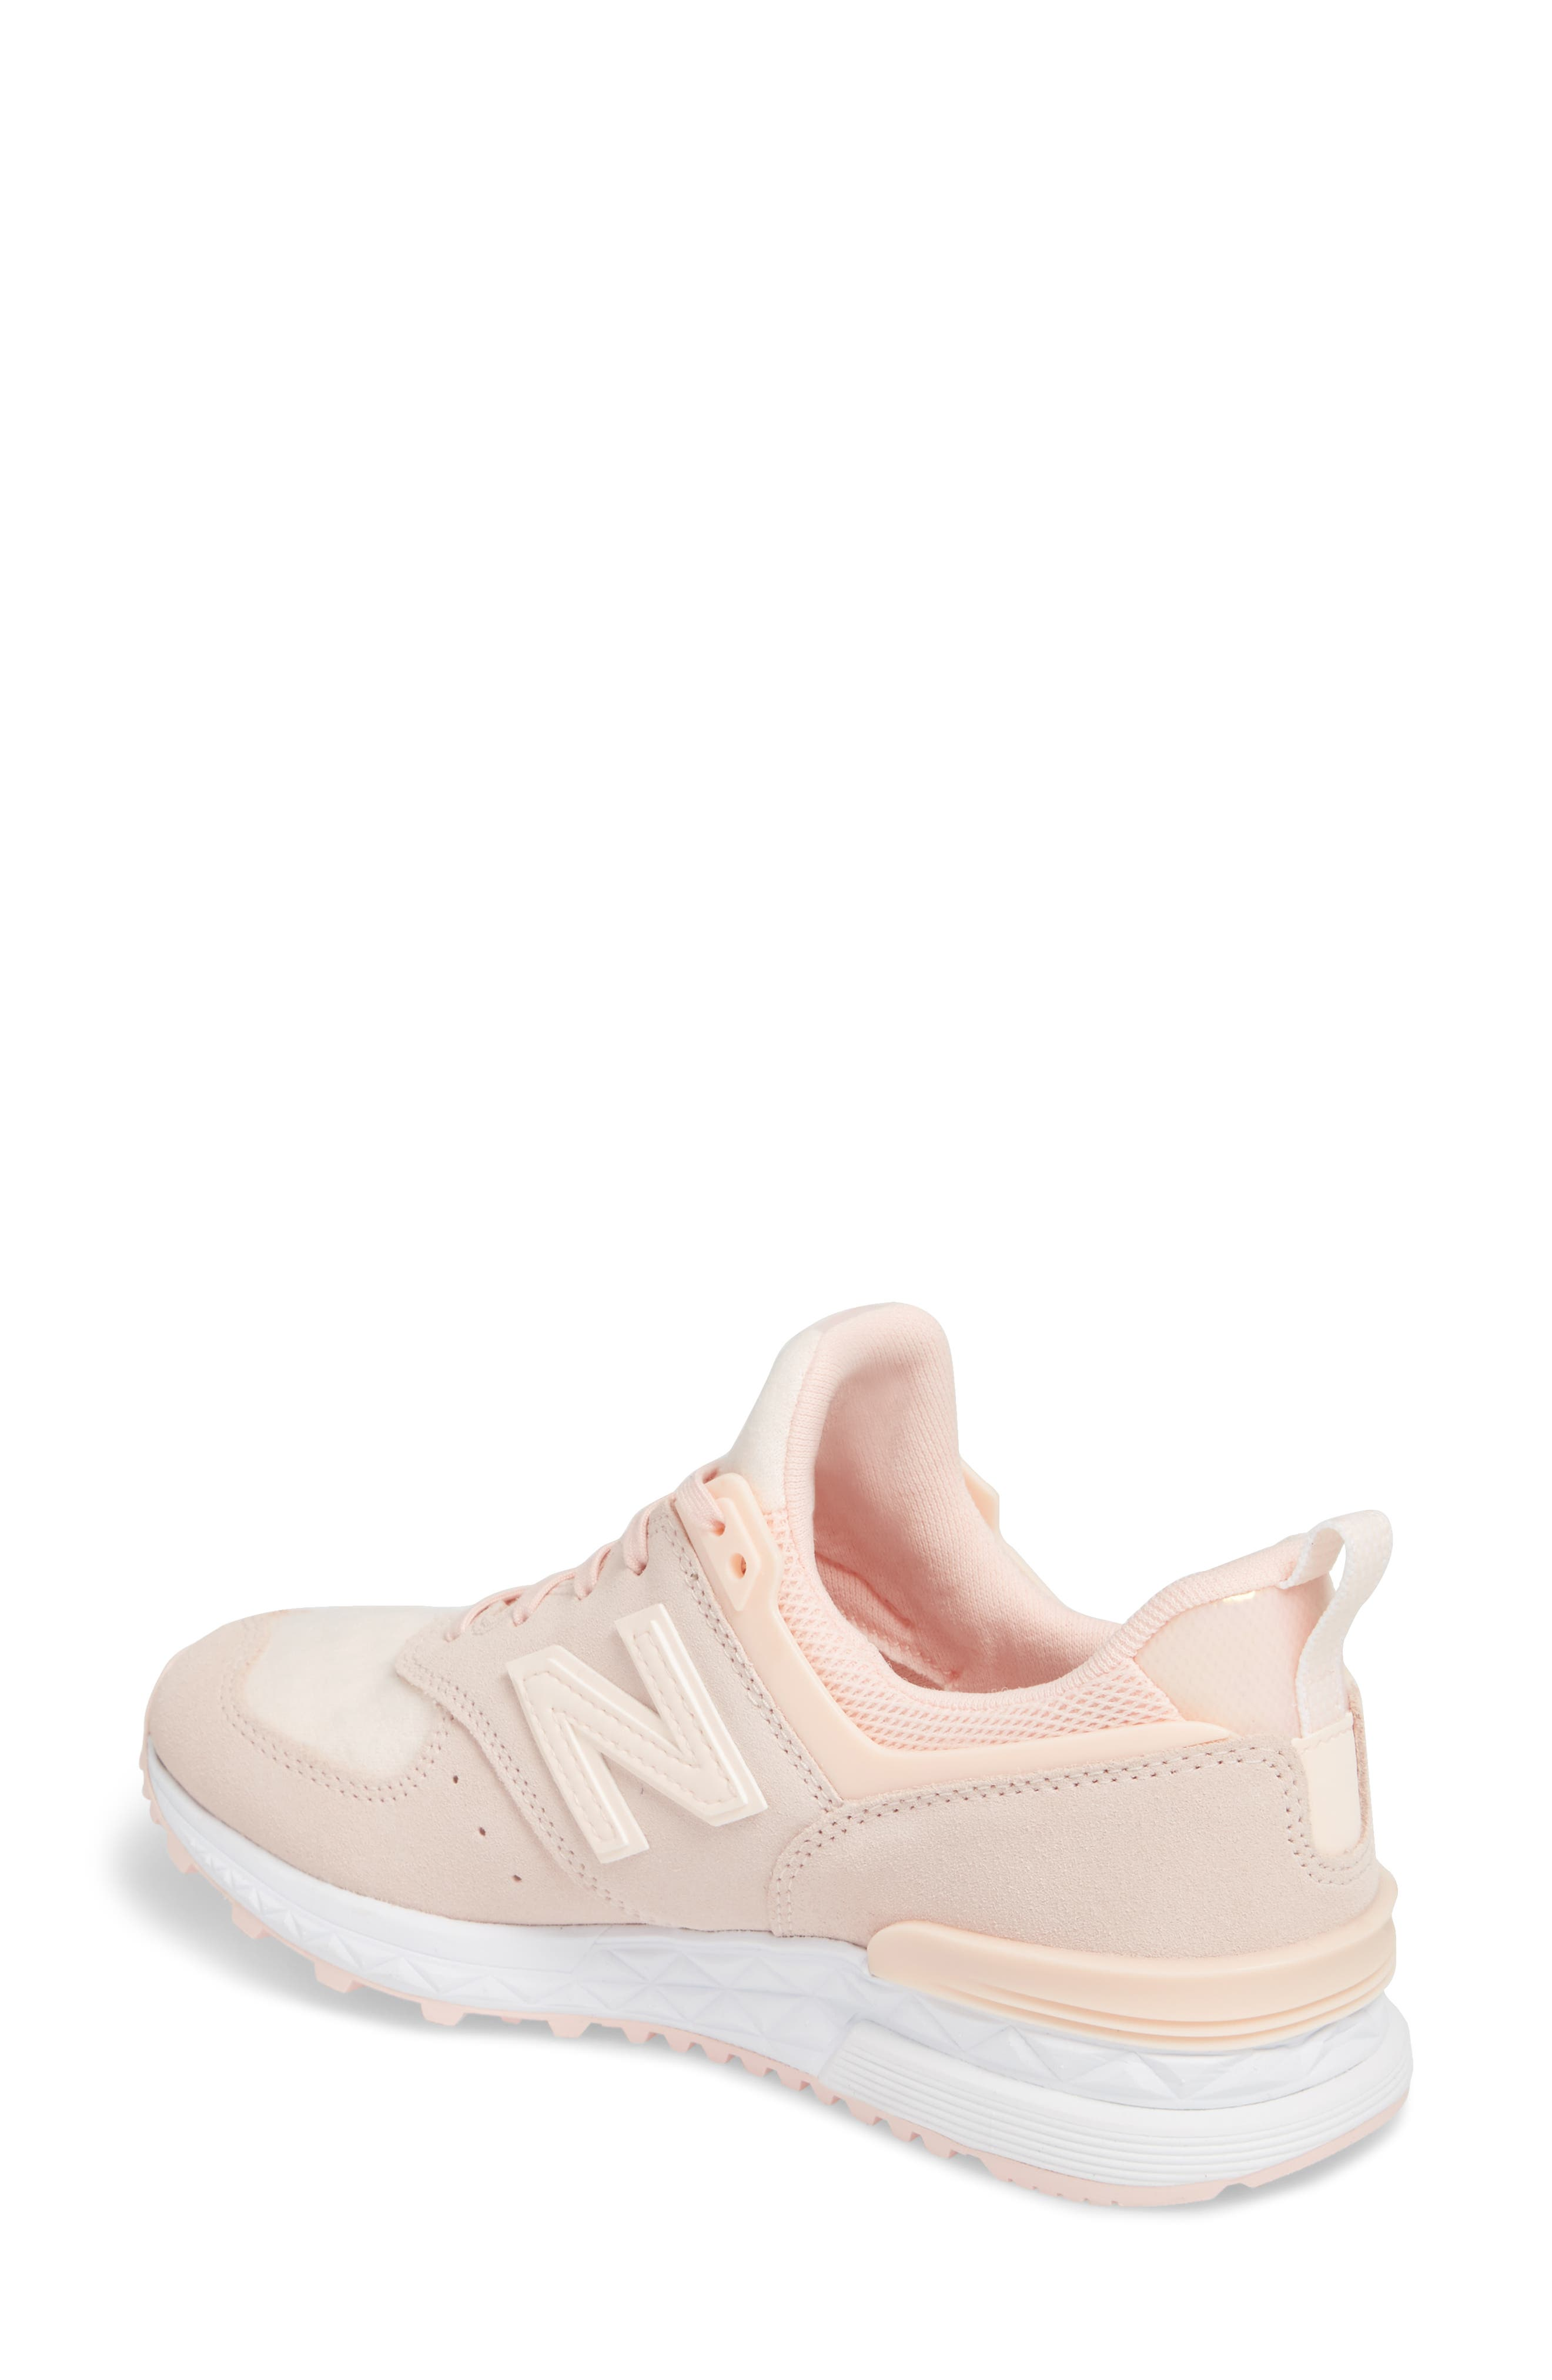 '574' Sneaker,                             Alternate thumbnail 2, color,                             Sunrise Glow